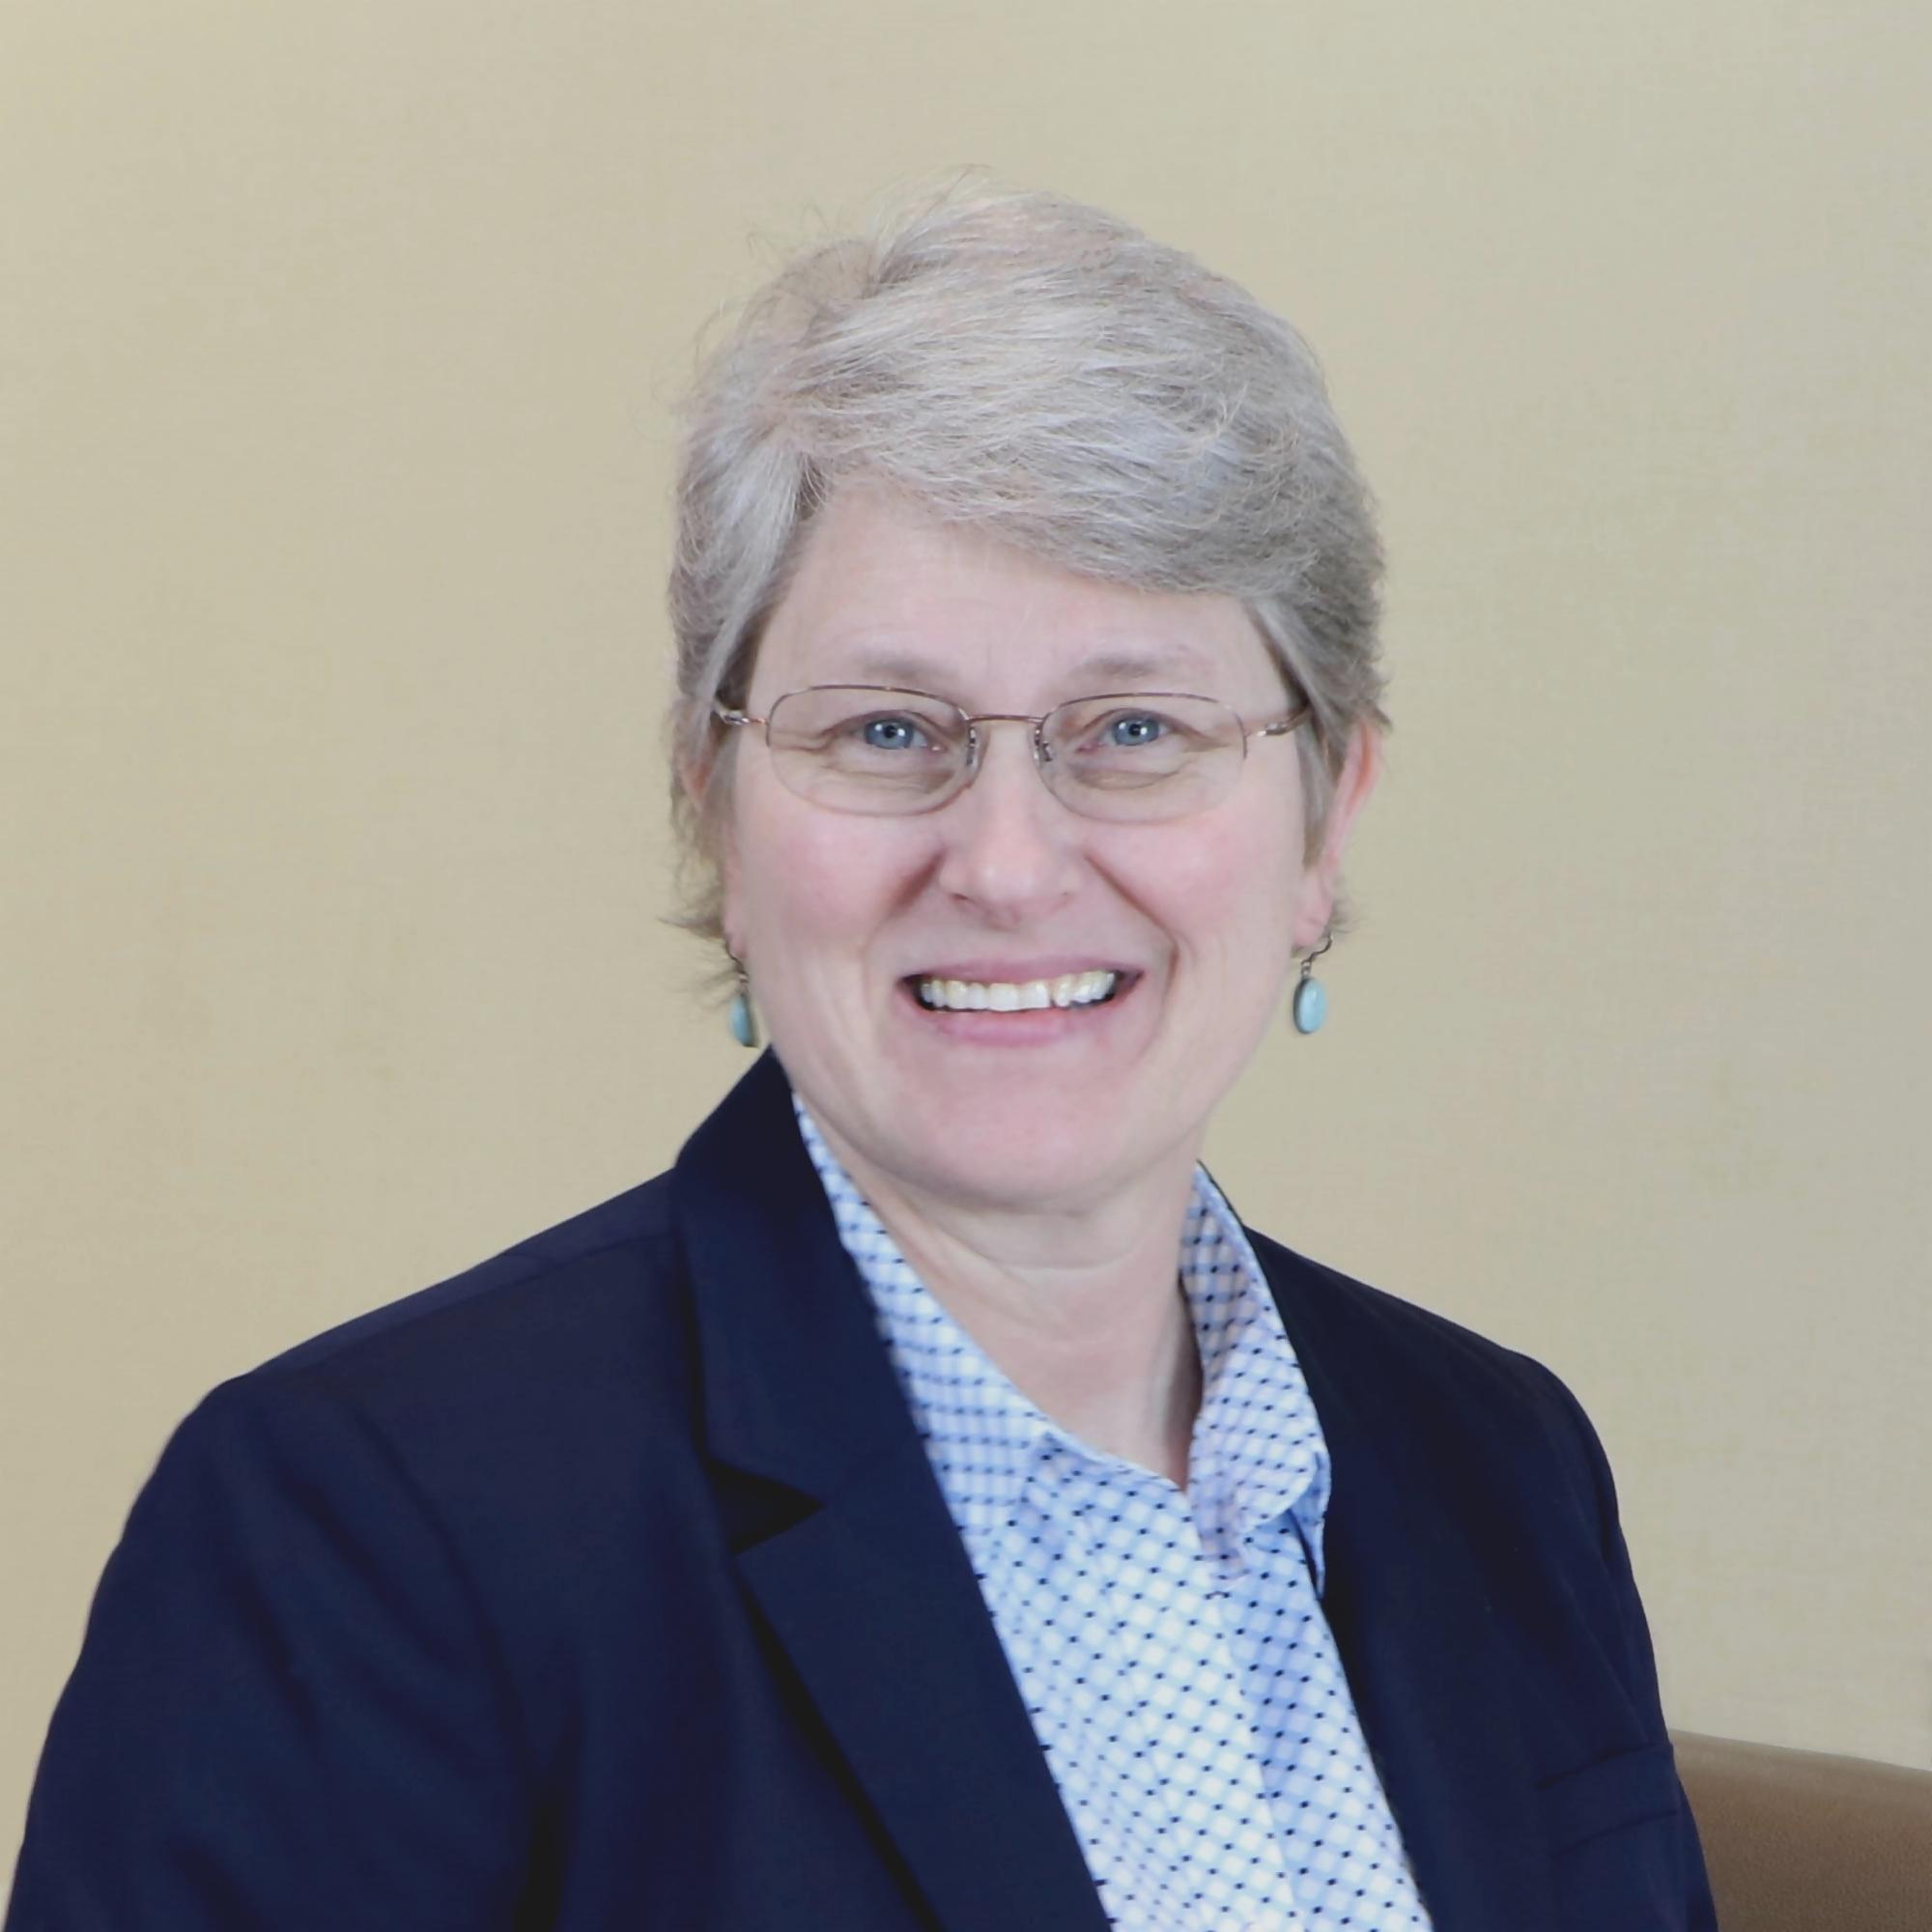 Dana M. Frentz, CHPA, PSP